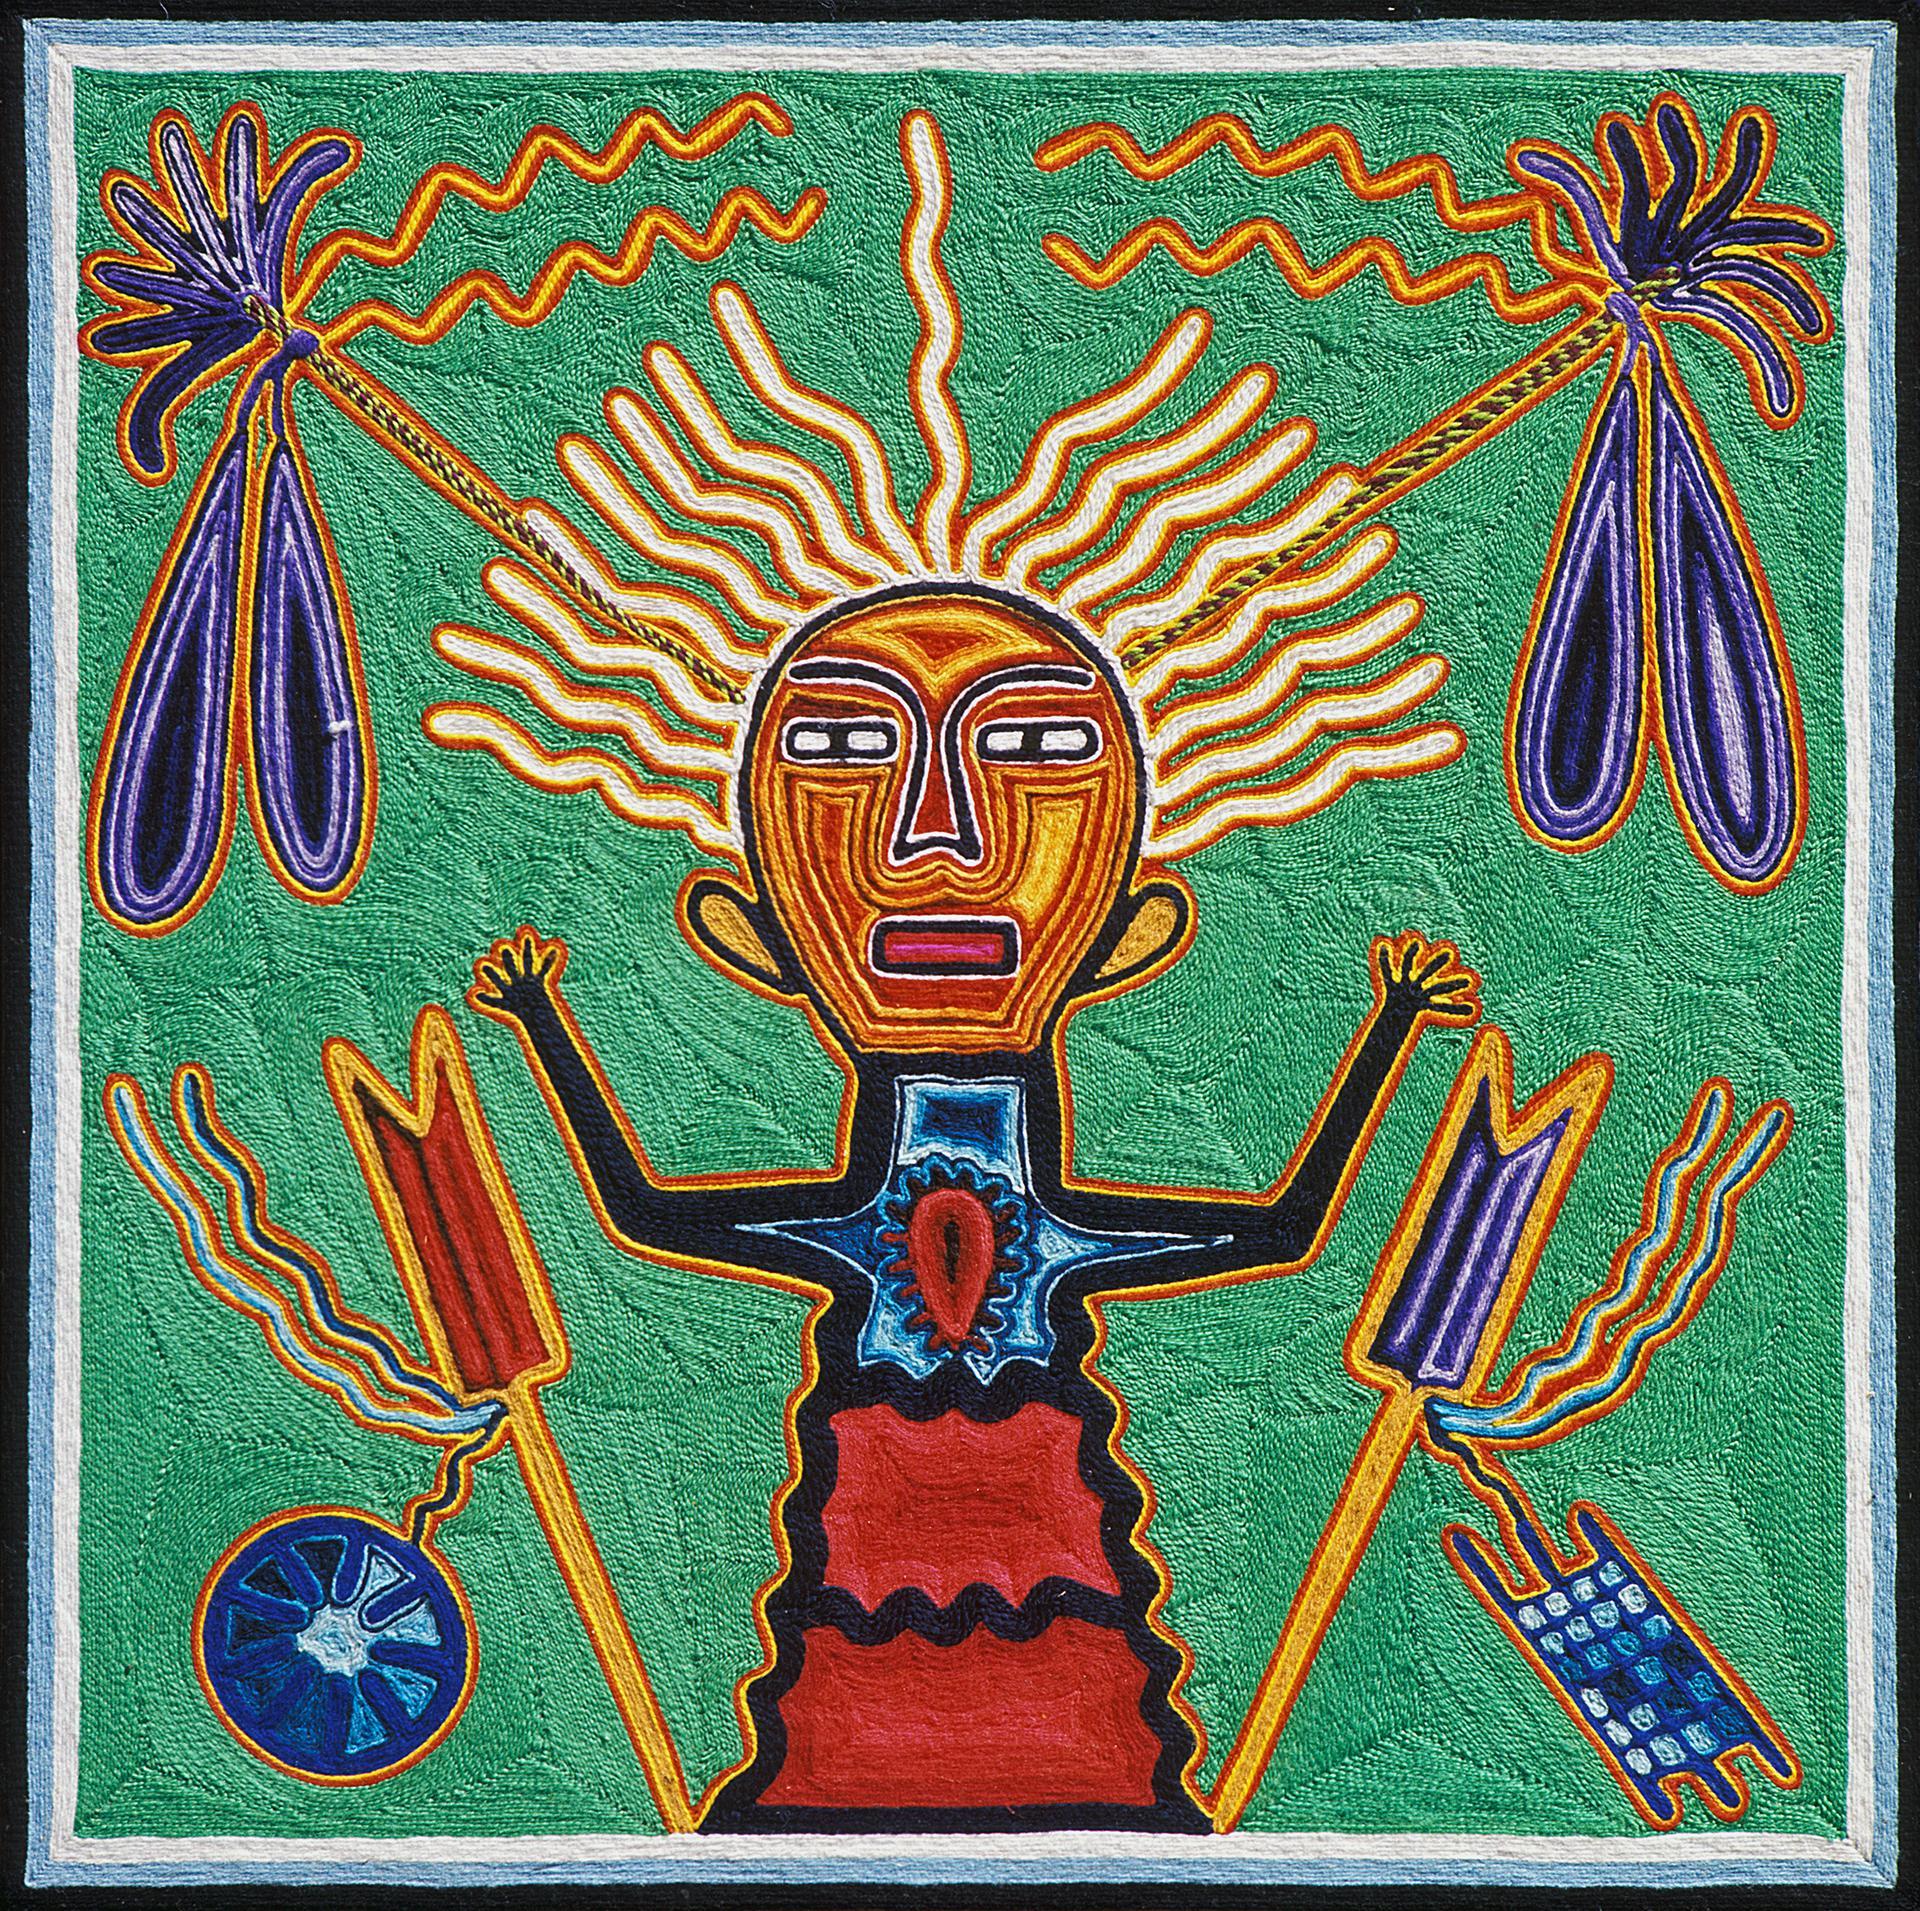 The Idol of Tatewarí - Tutukila Carrillo Sandoval 1974